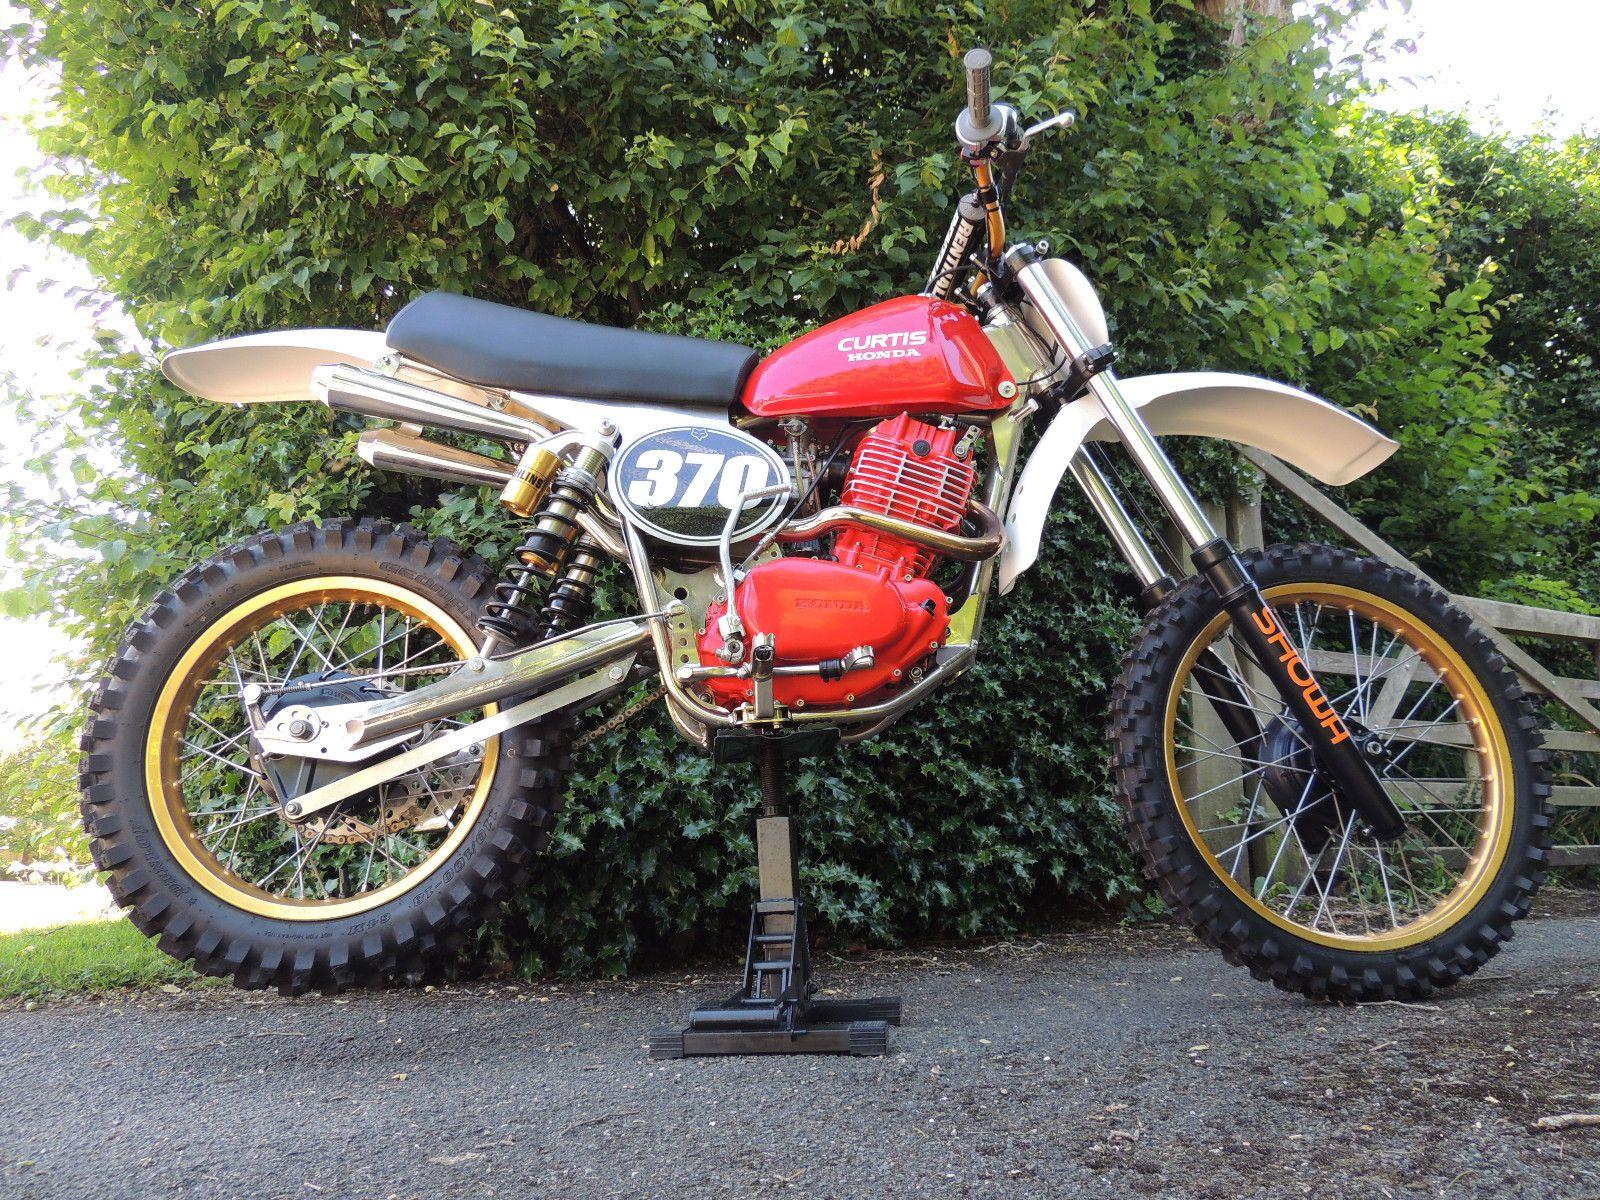 Ebay Curtis Honda 540 Twinshock Motocross Classic Vintage Evo Motorcycles Biker Vintage Motocross Motocross Honda